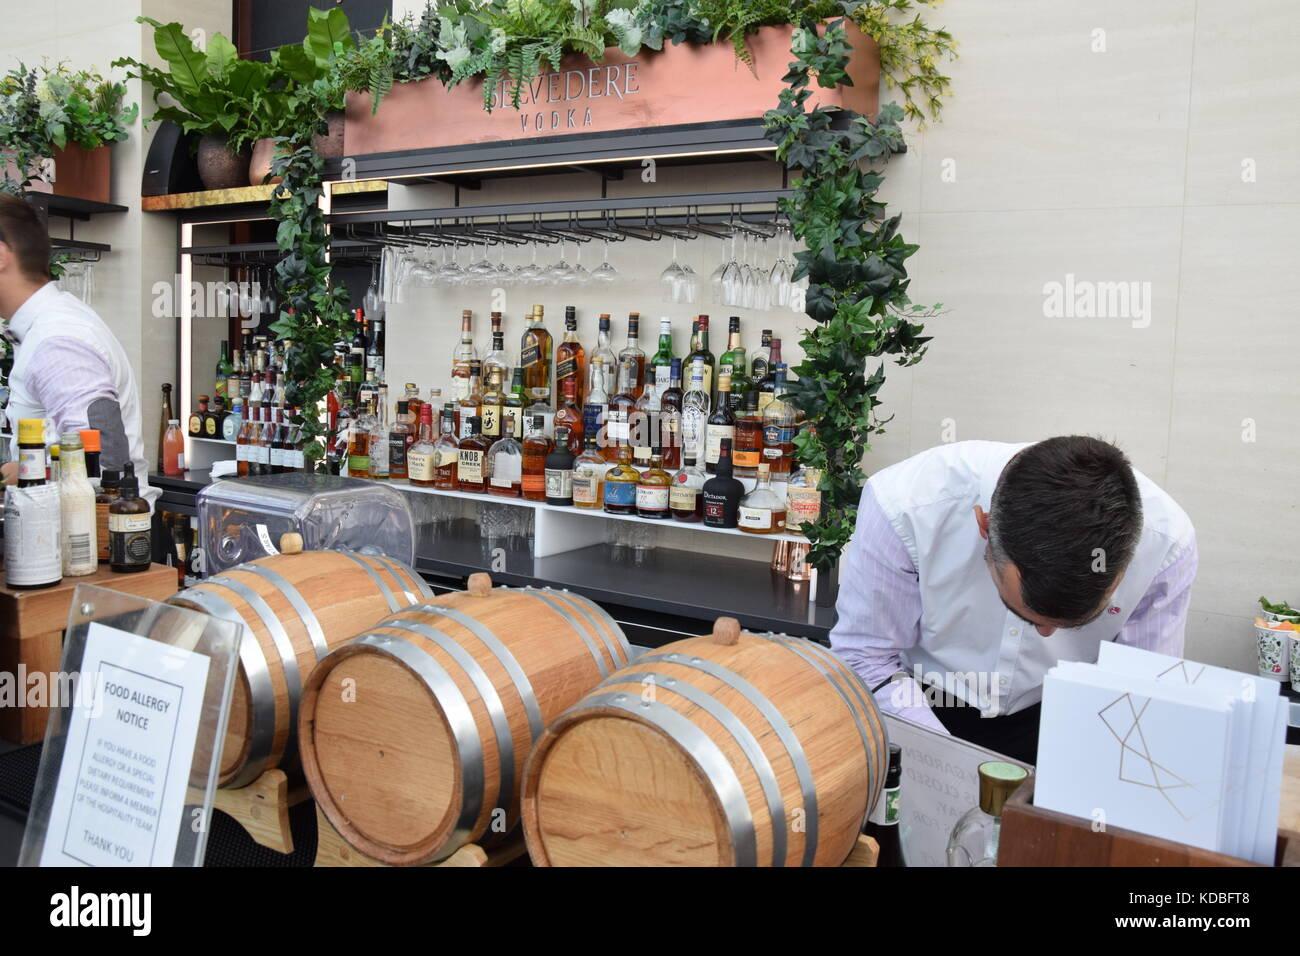 Bar Staff and Sky city Garden - Stock Image